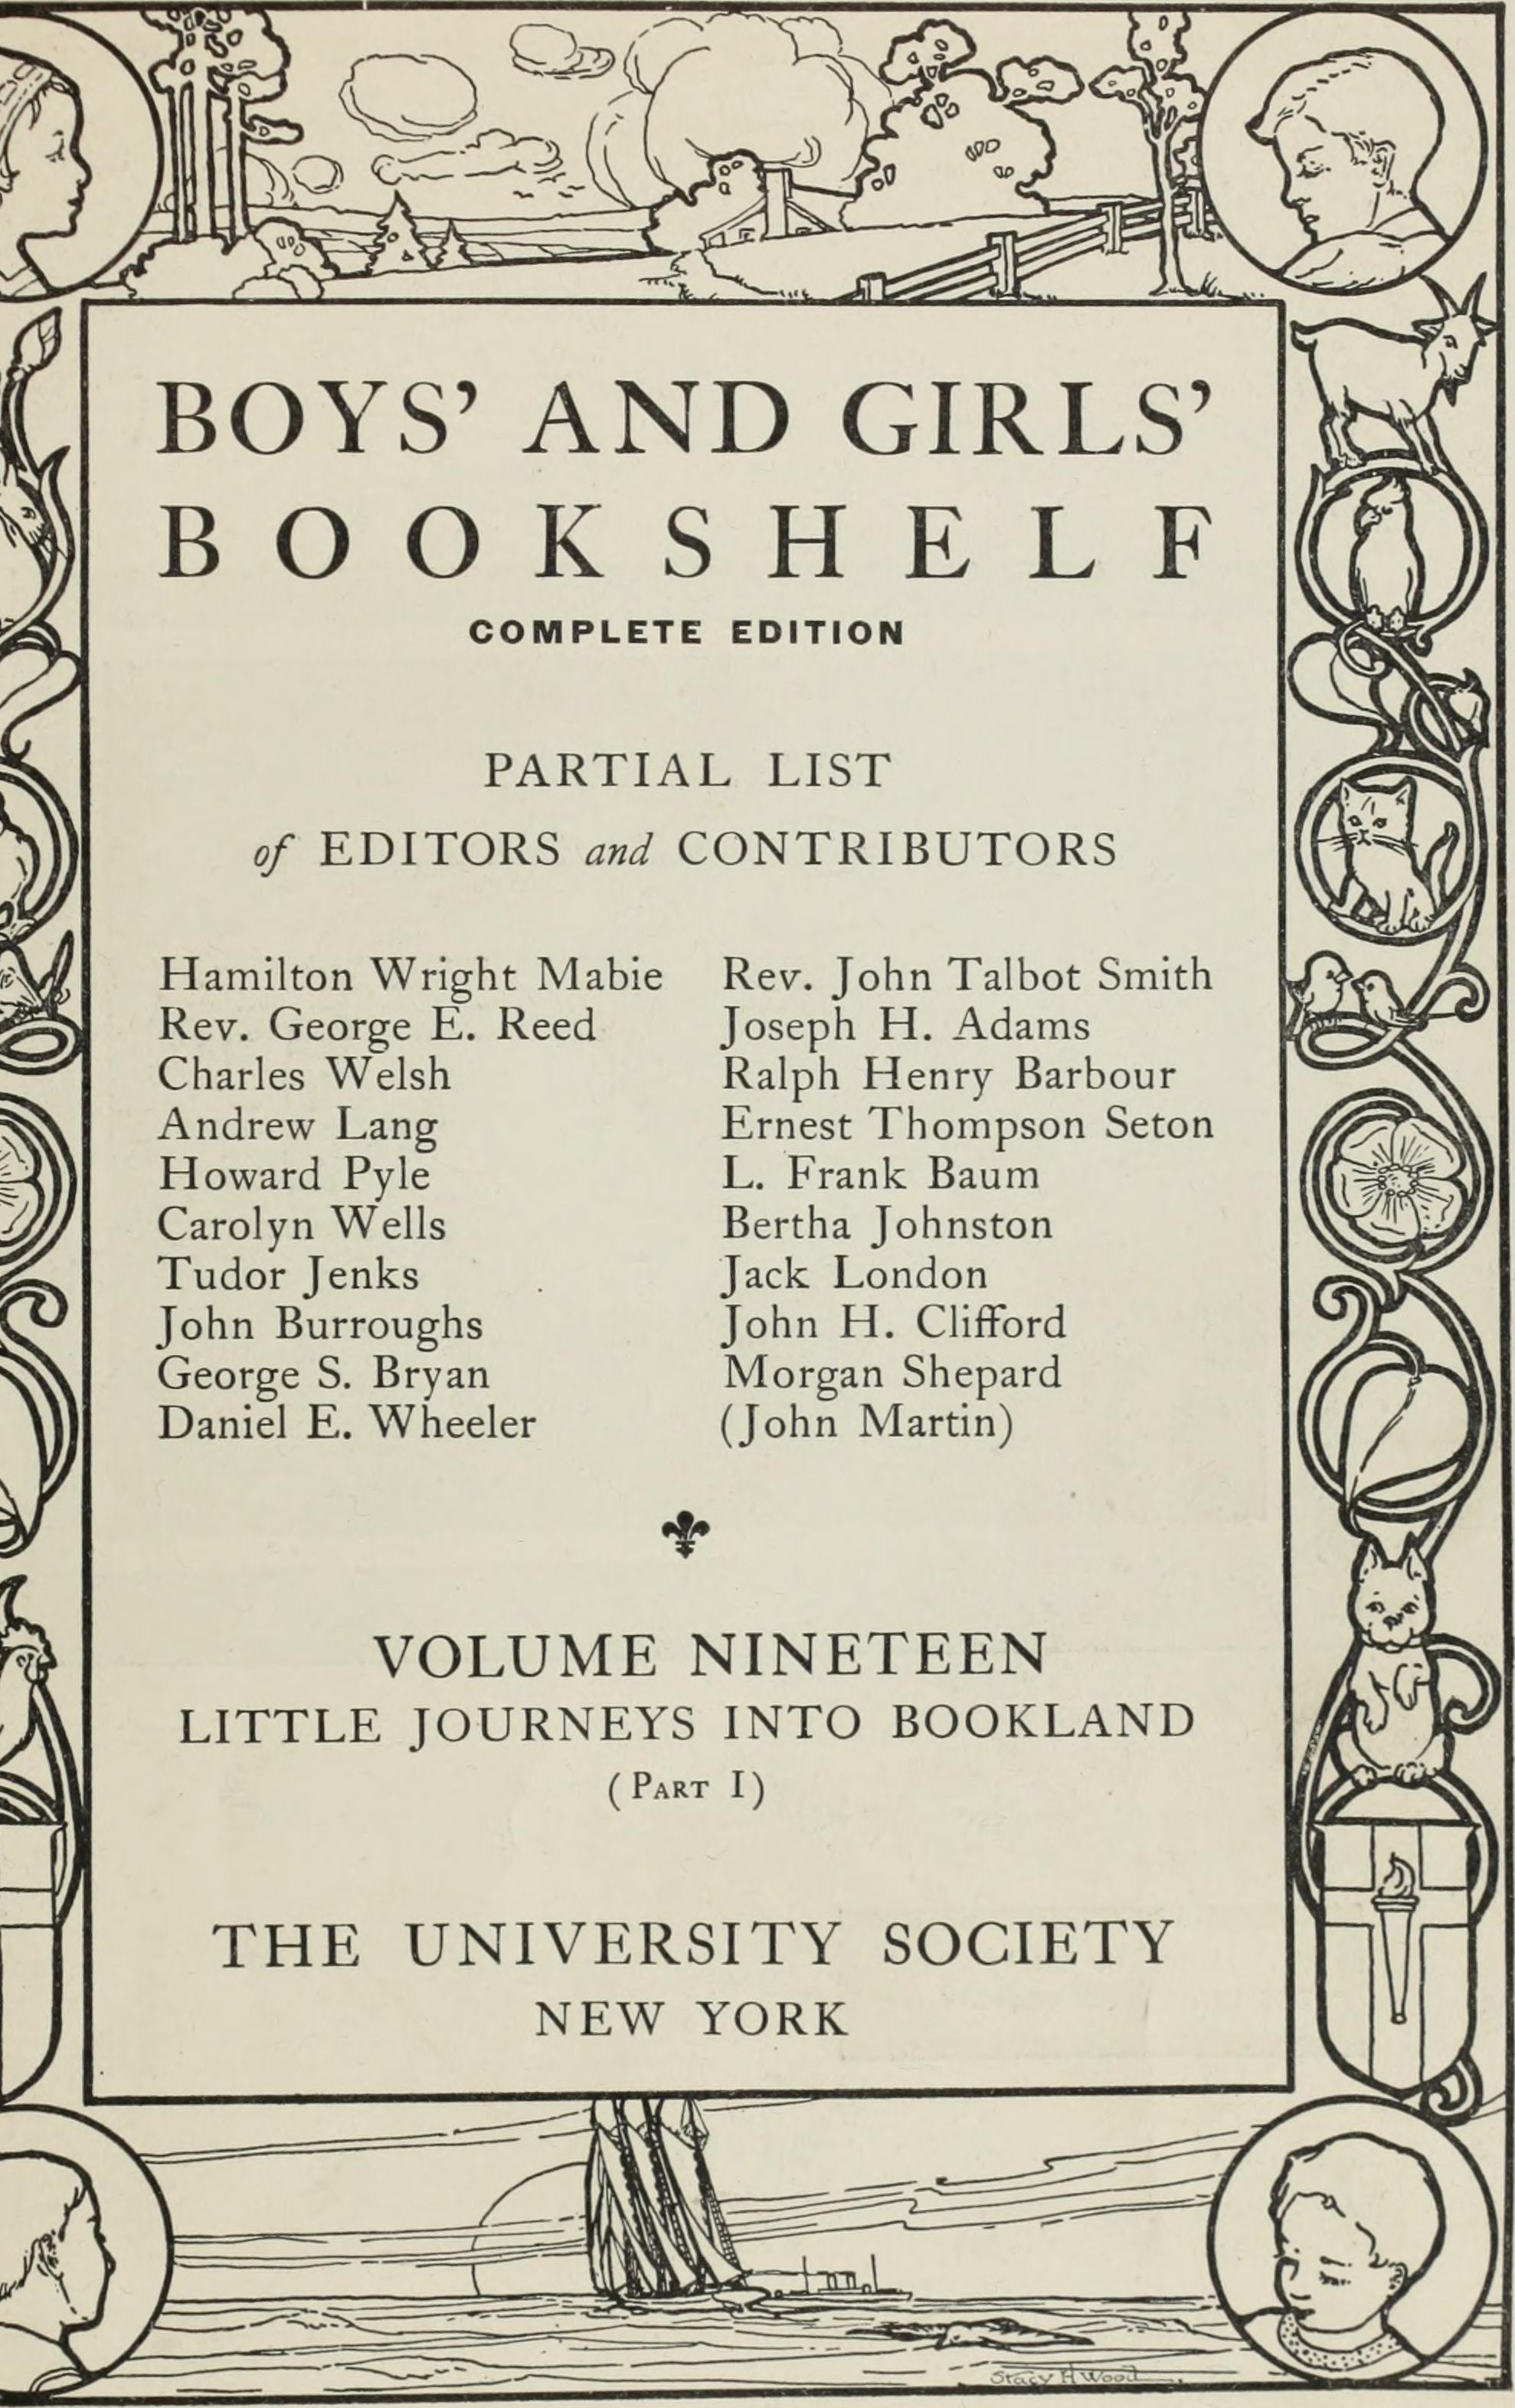 FileThe Bookshelf For Boys And Girls Little Journeys Into Bookland 1912